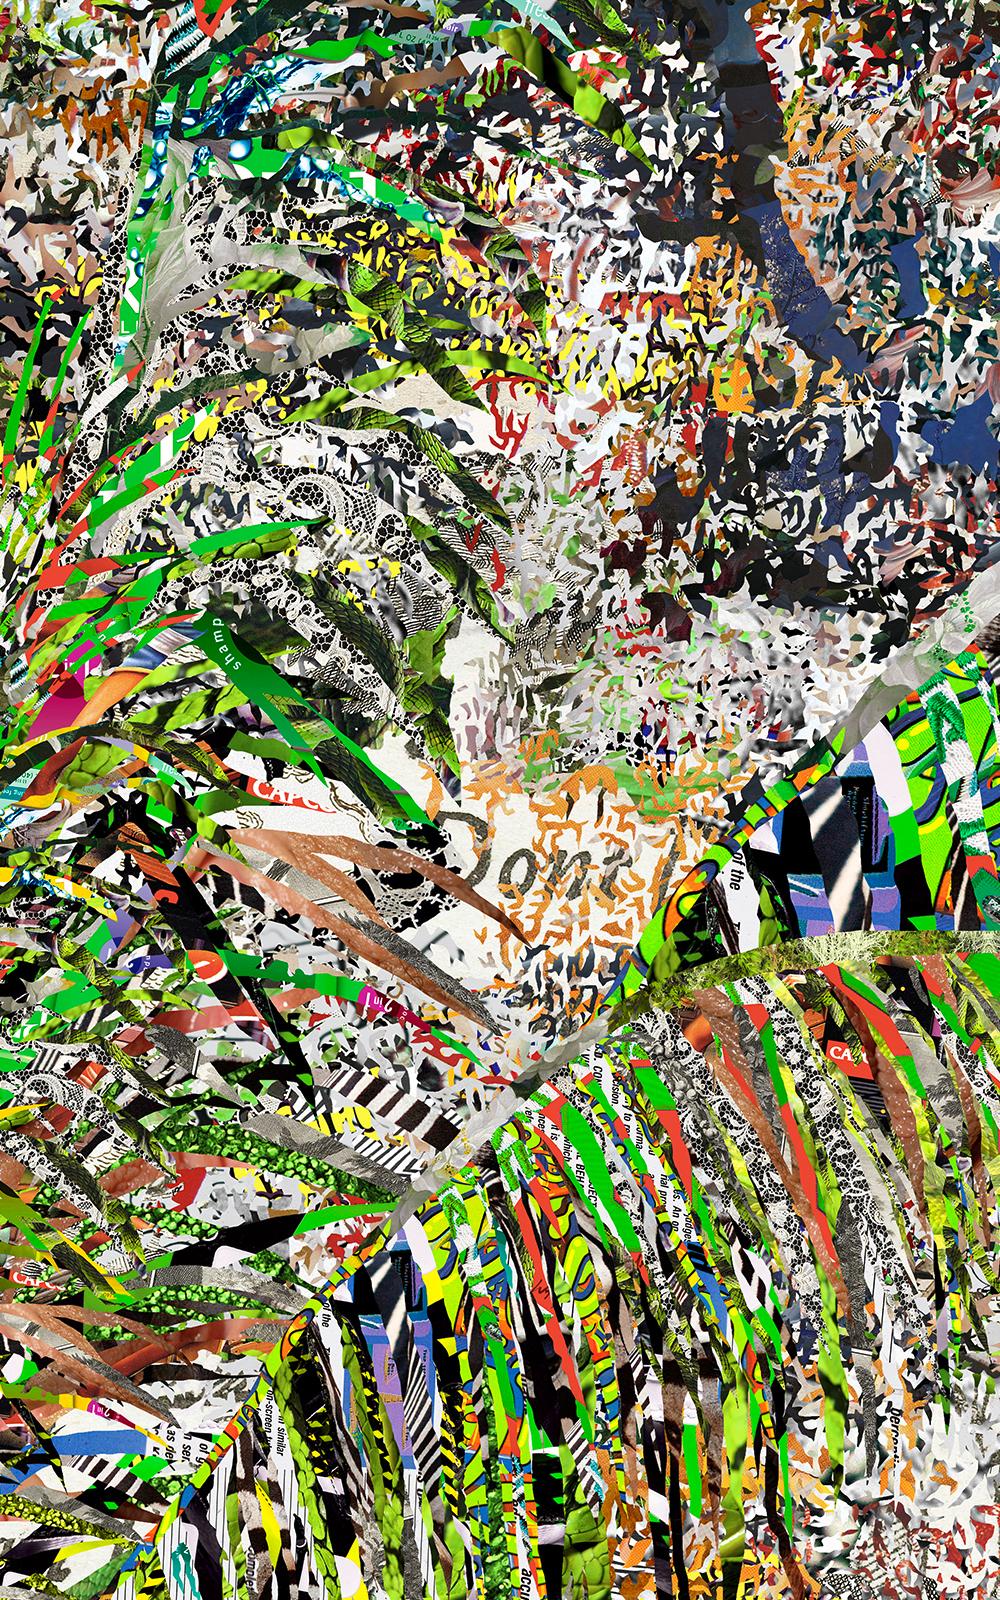 Case Simmons, Simmons & Burke, Sour Apple, Dutchmasters, Kohn Gallery,Pigment Print, Digital Collage,Digital Art, Photoshop Collage, Contemporary Collage, Photoshop Actions, Case Simmons Art, Collage Fine Art, Digital Landscape